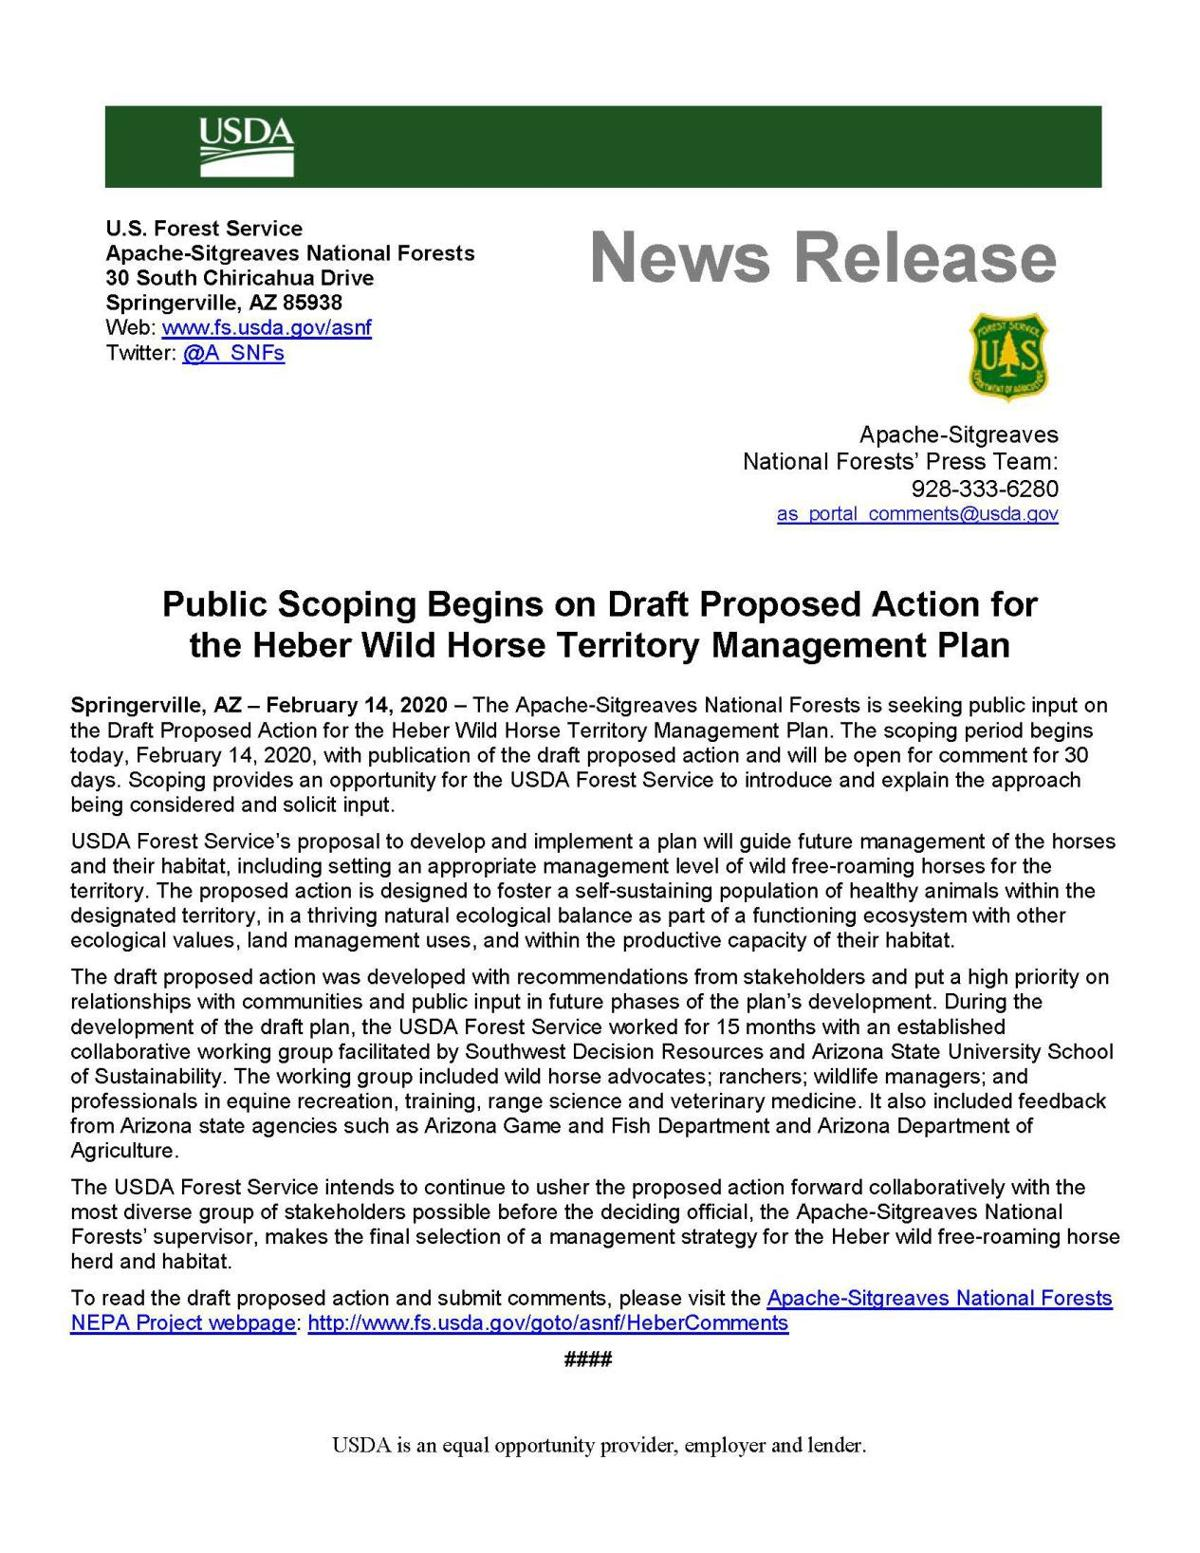 USFS releases Heber Wild Horse management plan draft